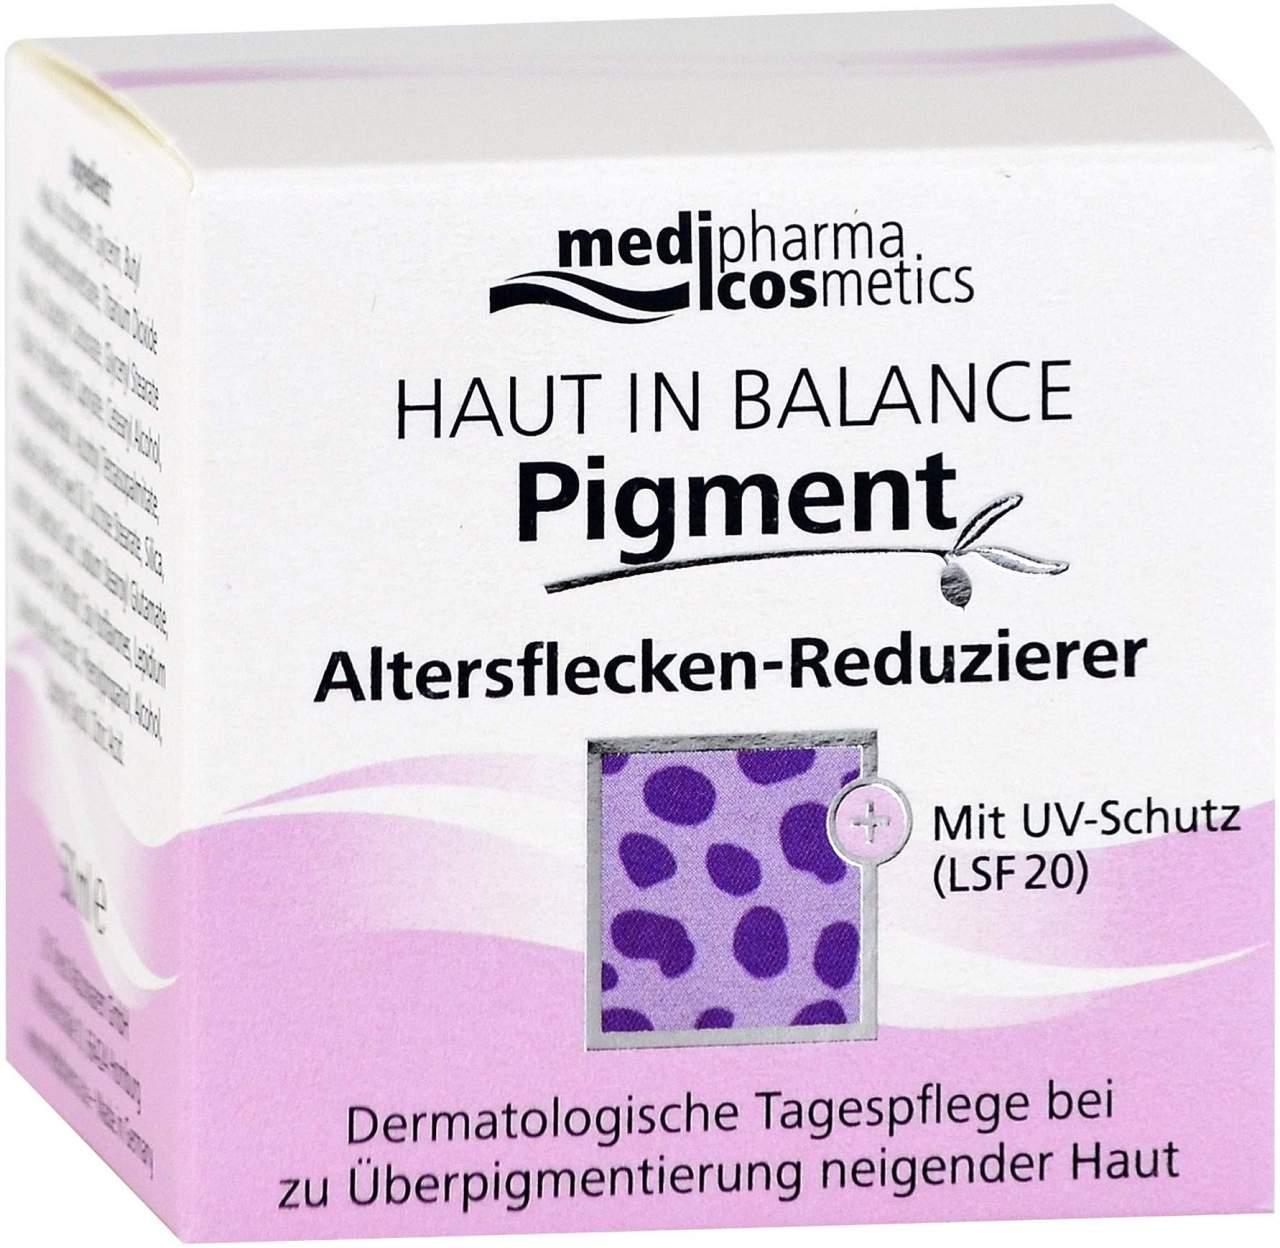 Haut in Balance Pigment Altersflecken Reduziercreme 50 ml Creme